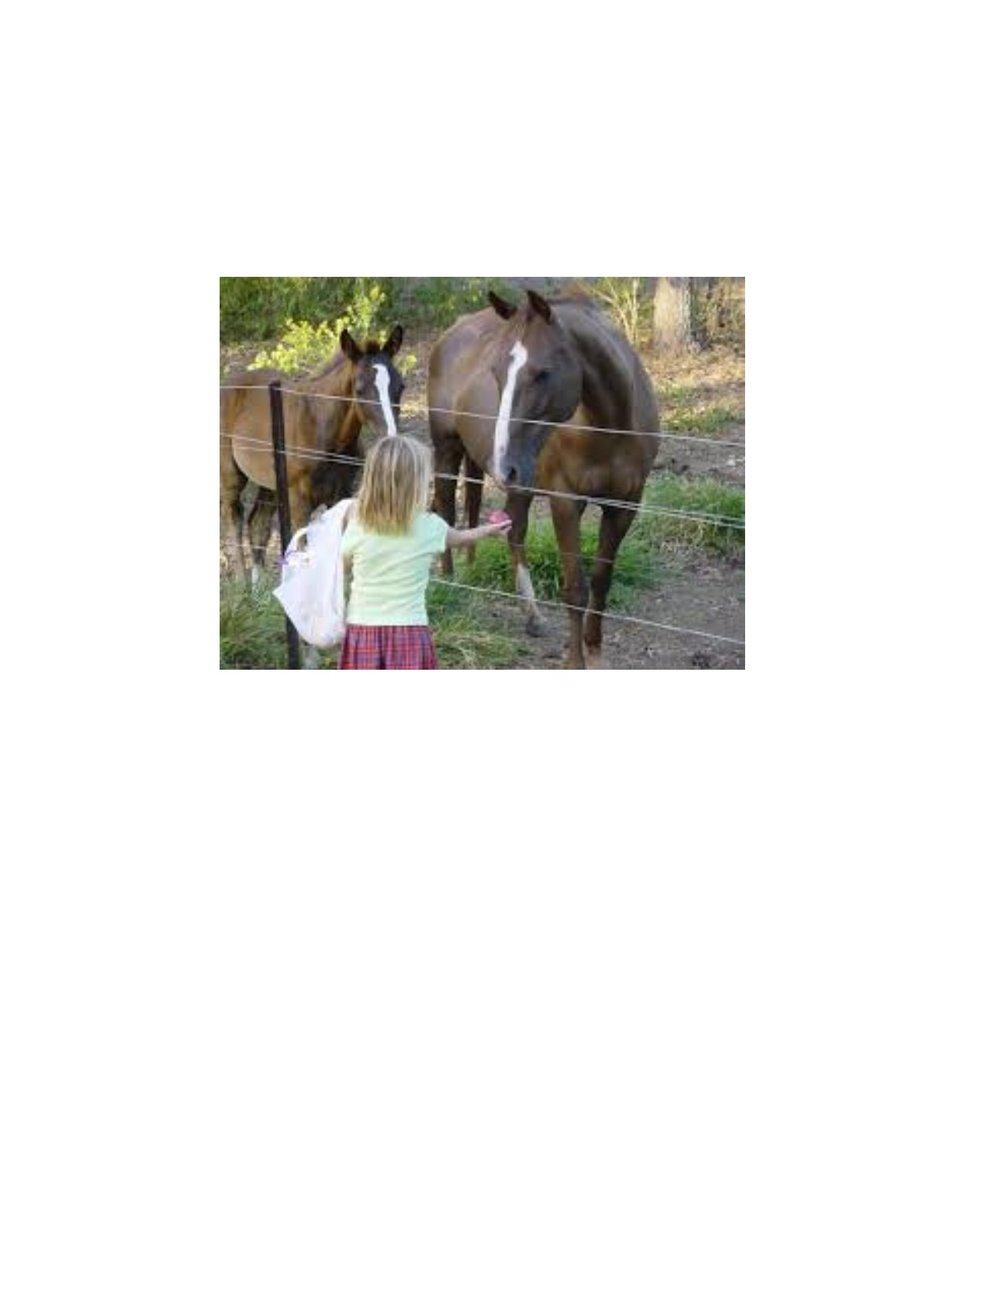 horse rescue picture.jpg